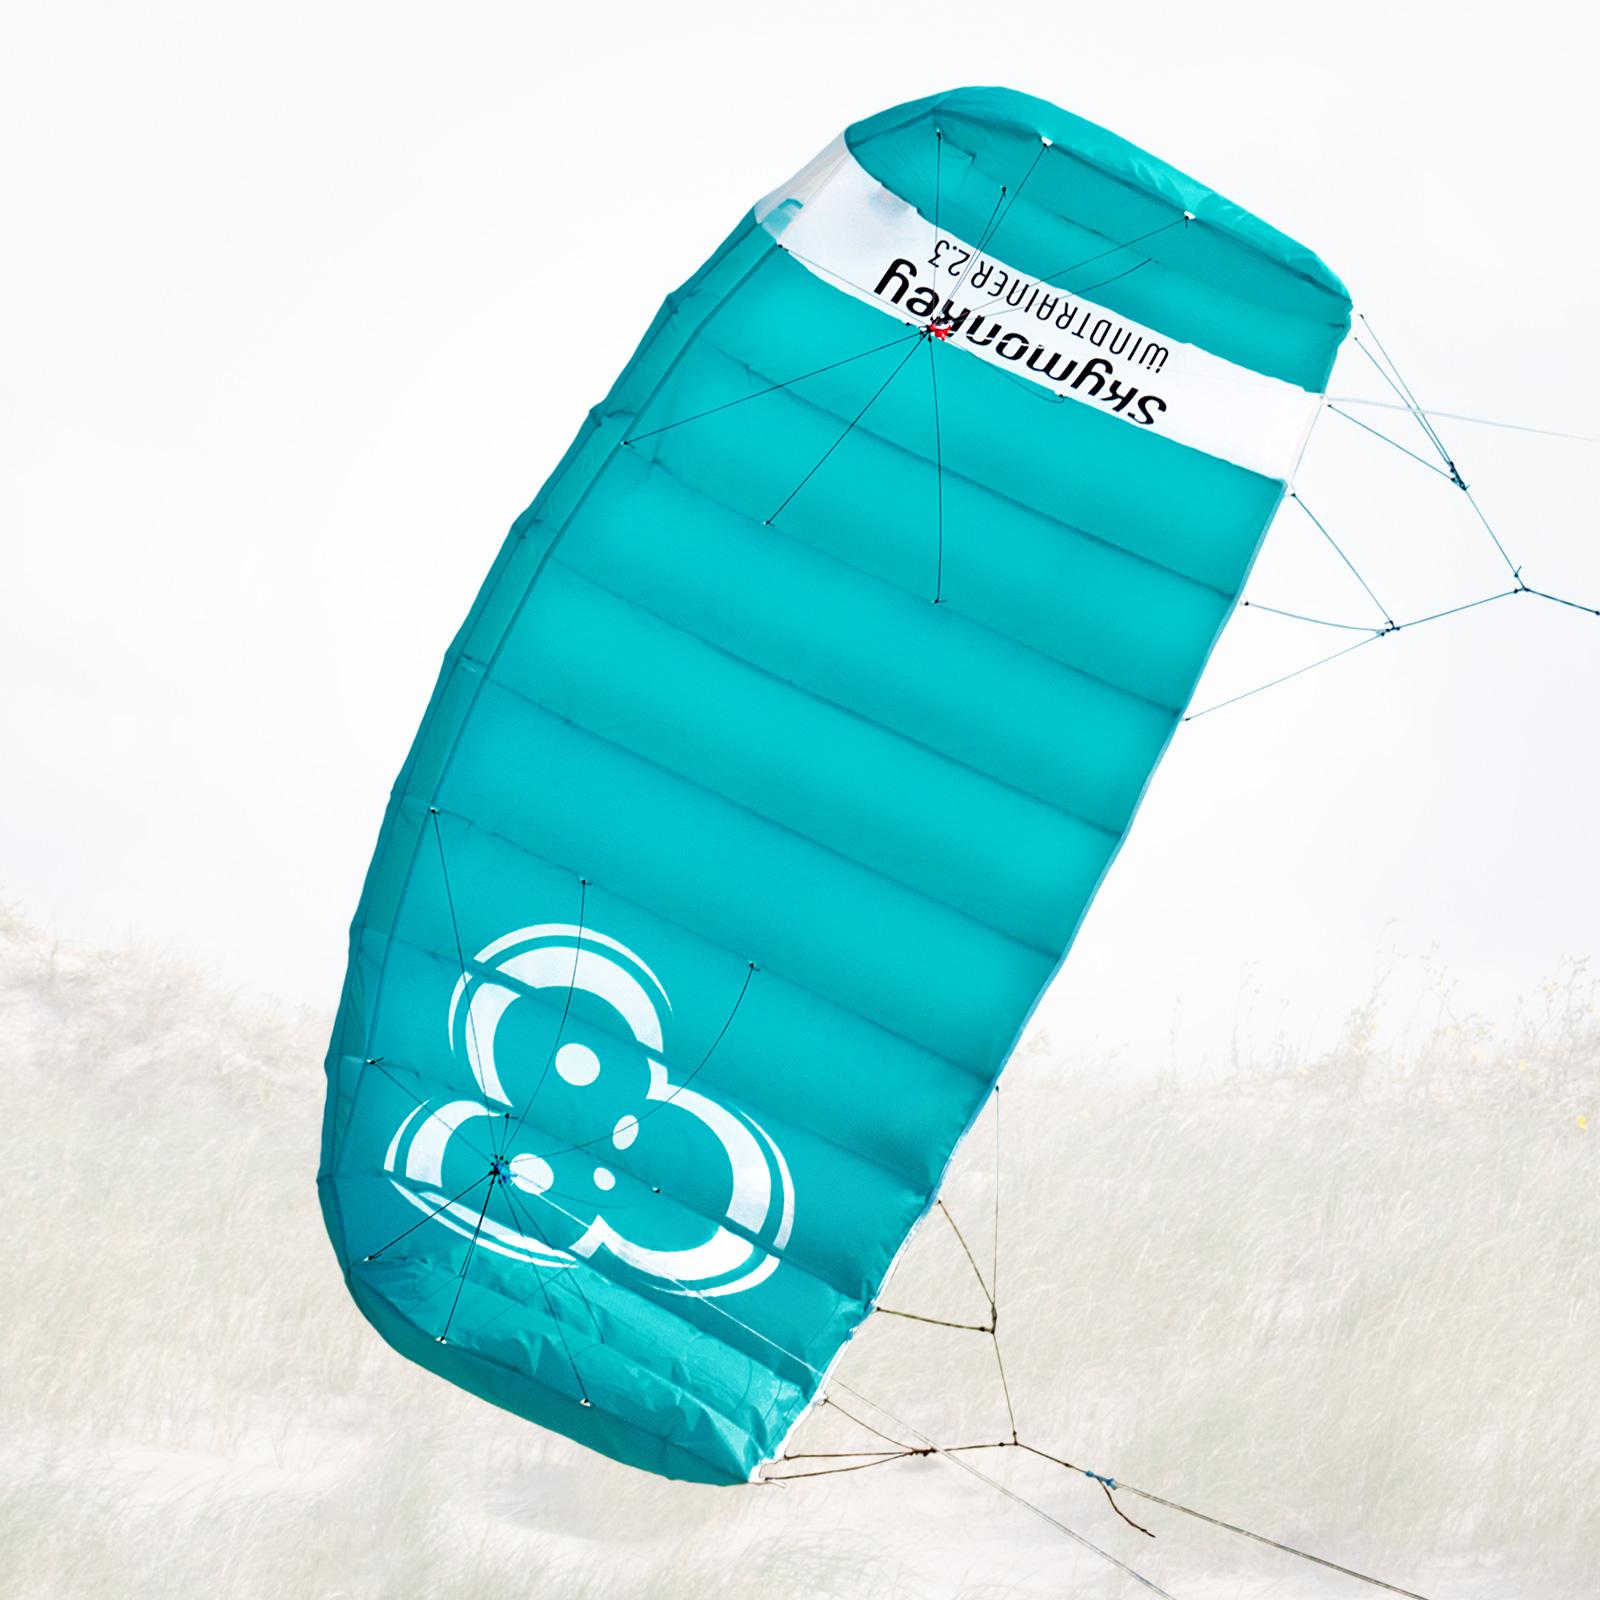 Lenkmatte SKYMONKEY Windtrainer Trainerkite Kite Lenkdrachen Drachen Drachen Drachen Lenk Matte b4f5cb